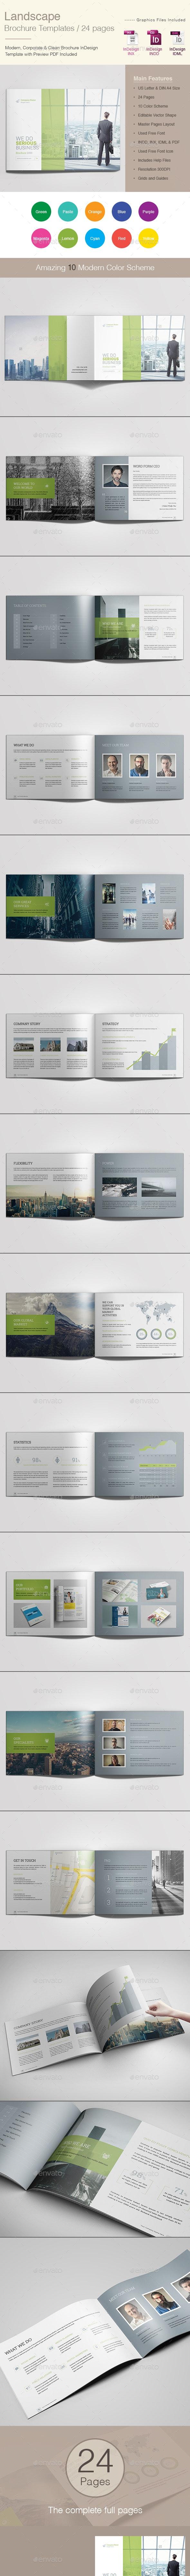 Landscape Brochure Templates - Corporate Brochures